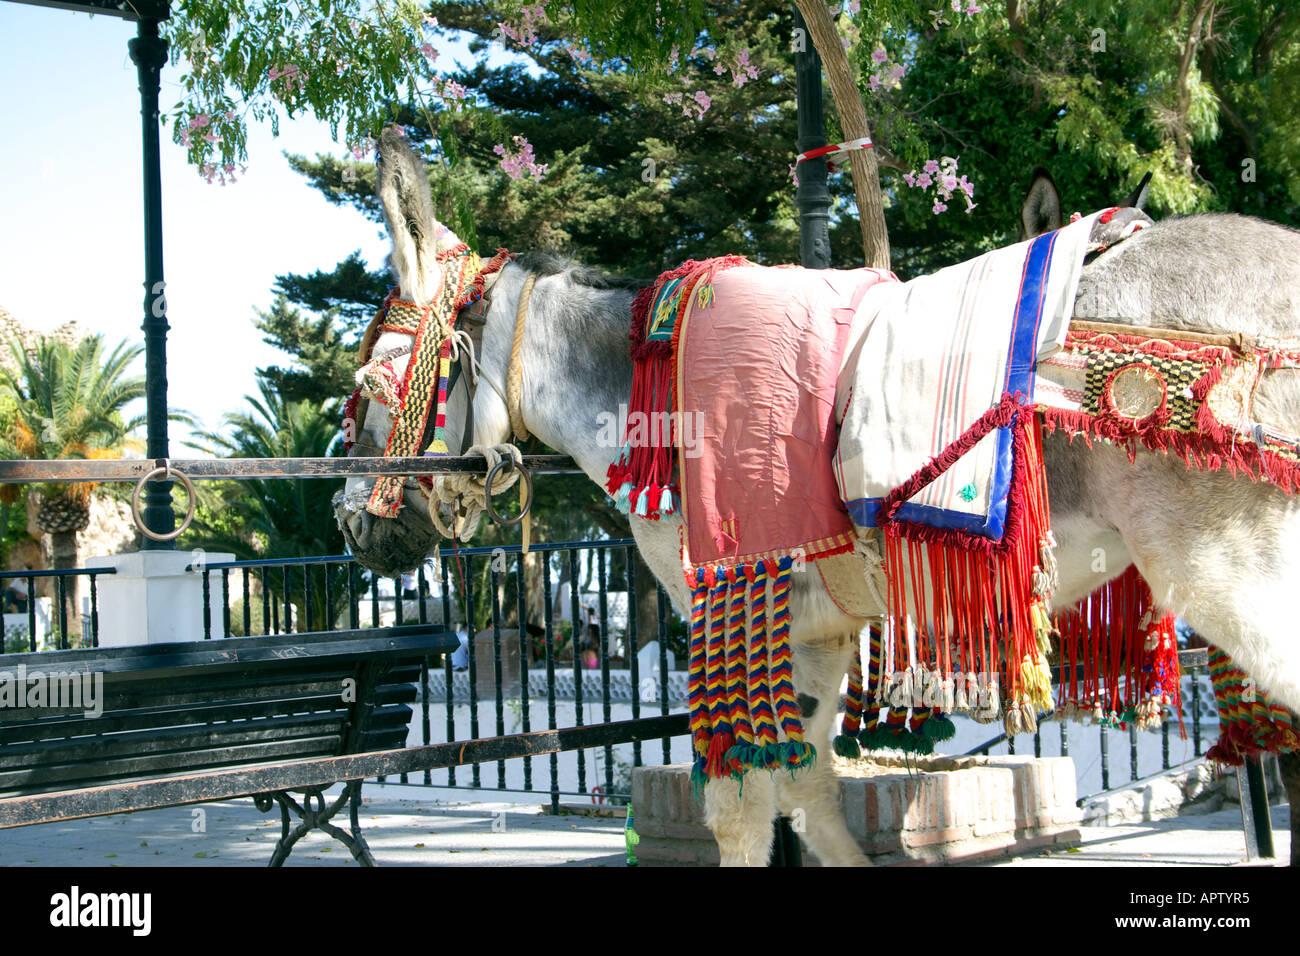 Ane Baudet Âne attaché en attente taxi âne âne baudet domestique animal